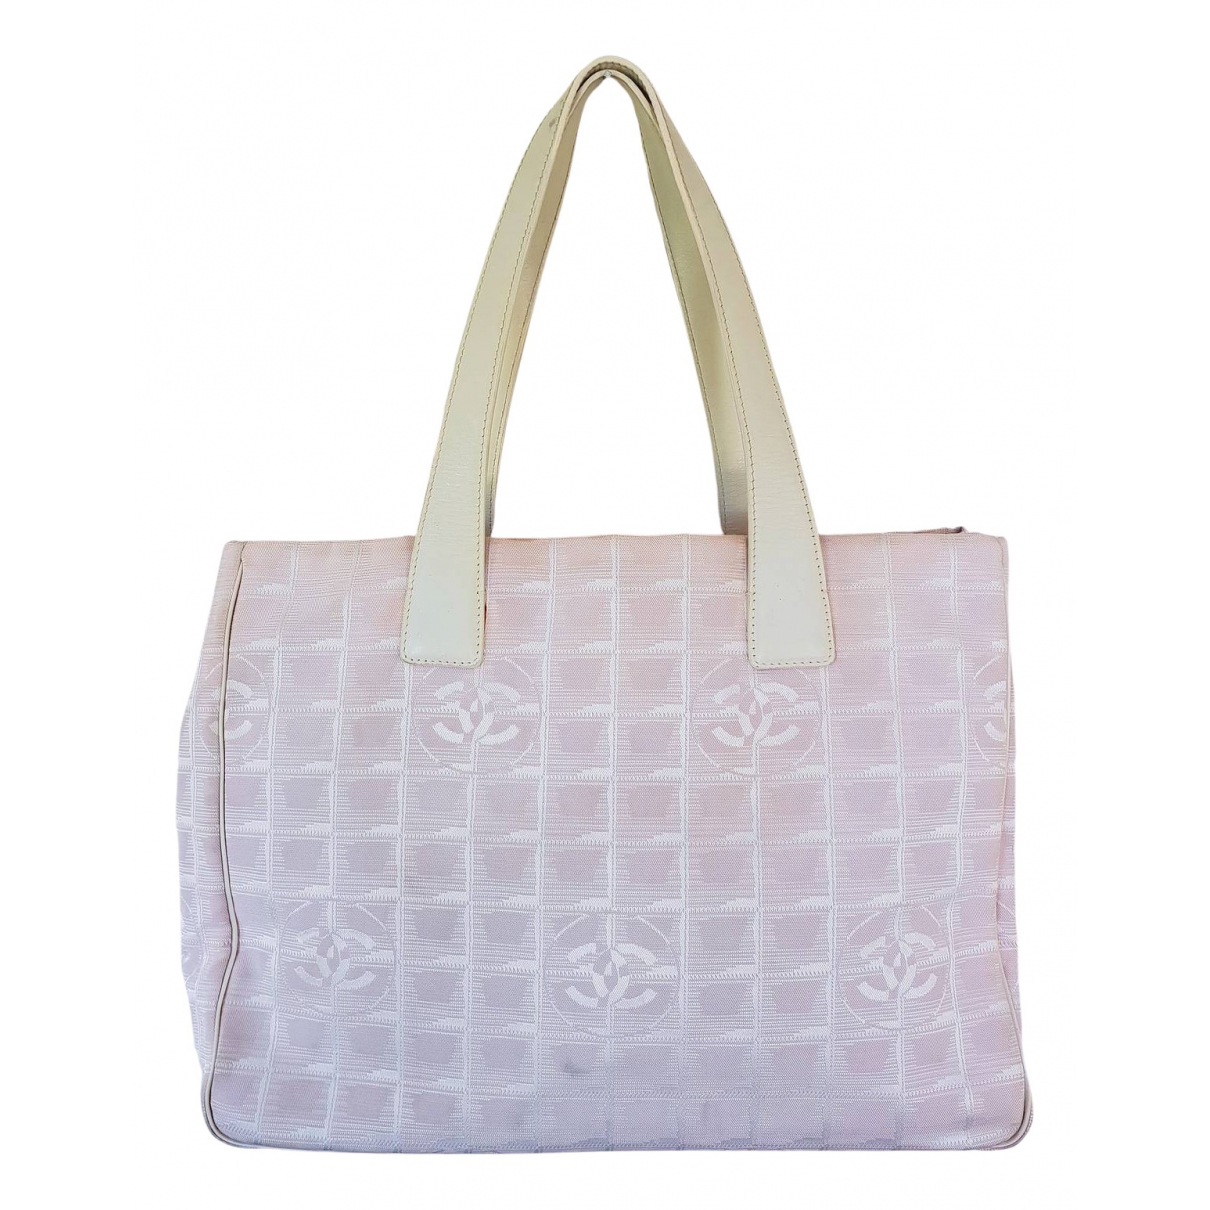 Chanel \N Pink Cloth handbag for Women \N